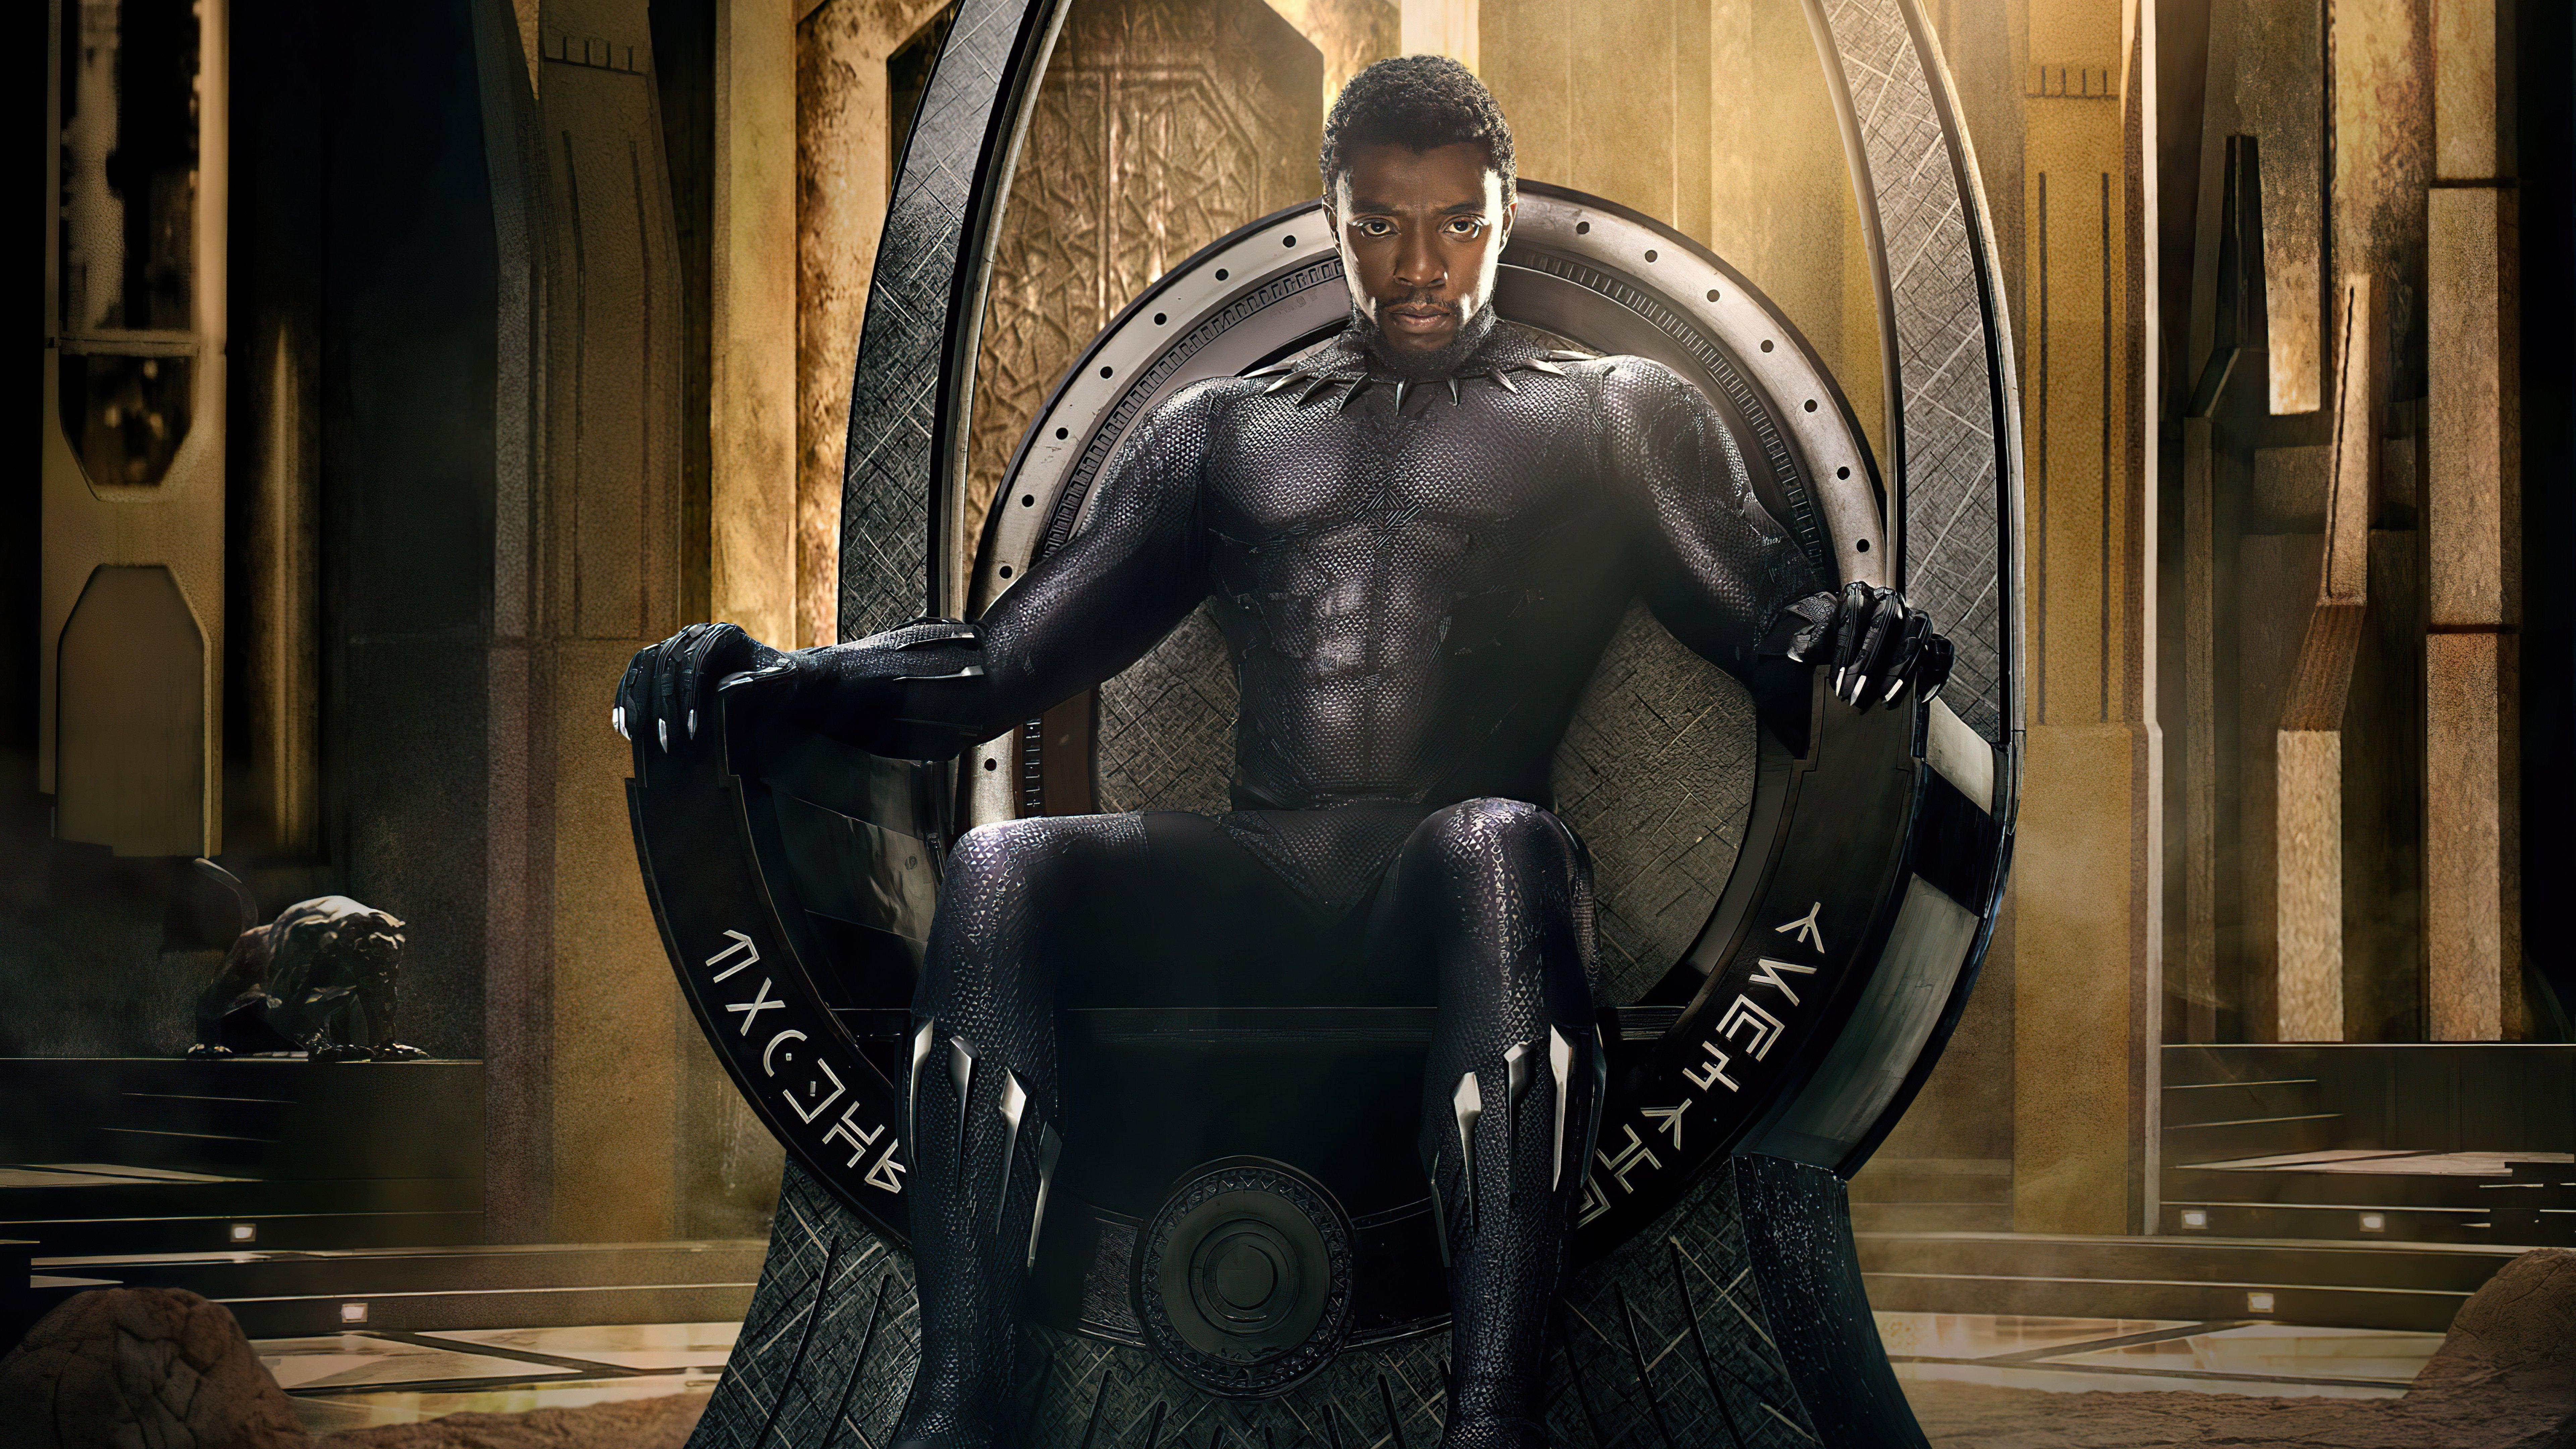 Wallpaper Chadwick Aaron Boseman Black Panther